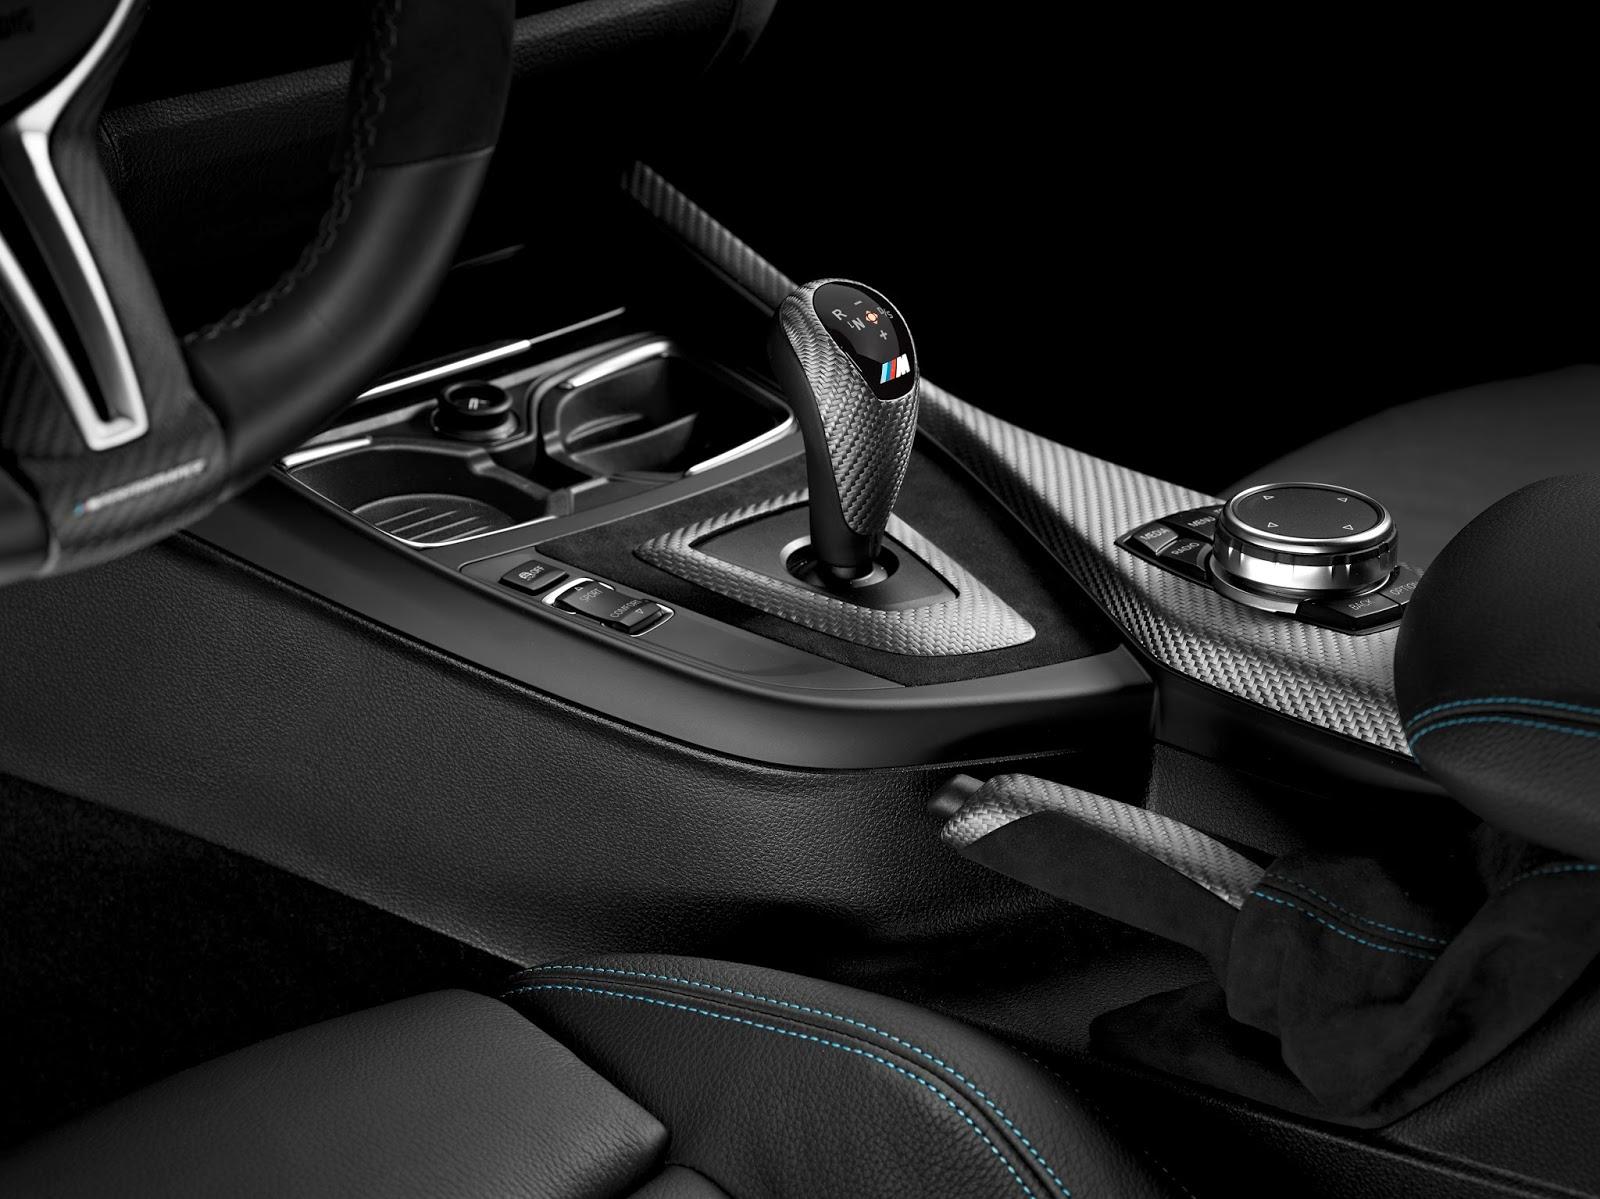 P90203627 highRes bmw m2 coup with bmw Νέα Αξεσουάρ M Performance για τη νέα BMW M2 Coupé. BMW, BMW M2, BMW M2 Coupé, Αξεσουάρ